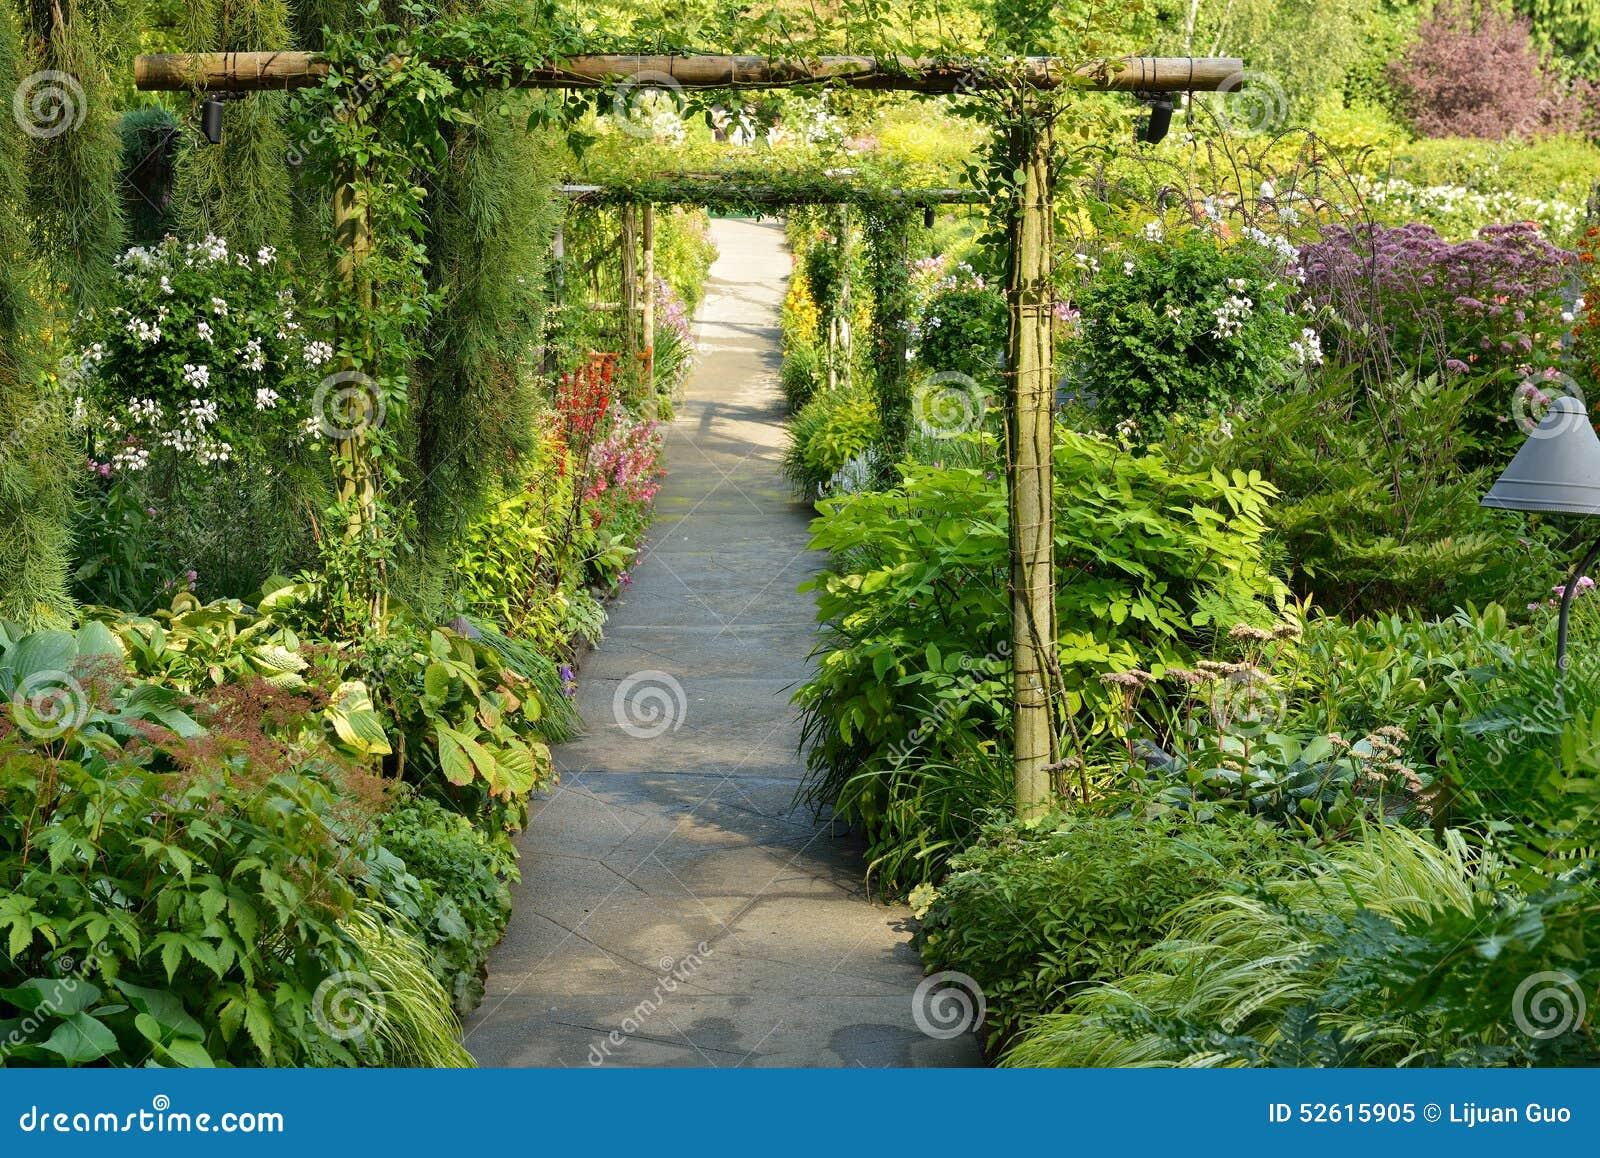 Flower Garden Walkway Stock Photo - Image: 52615905